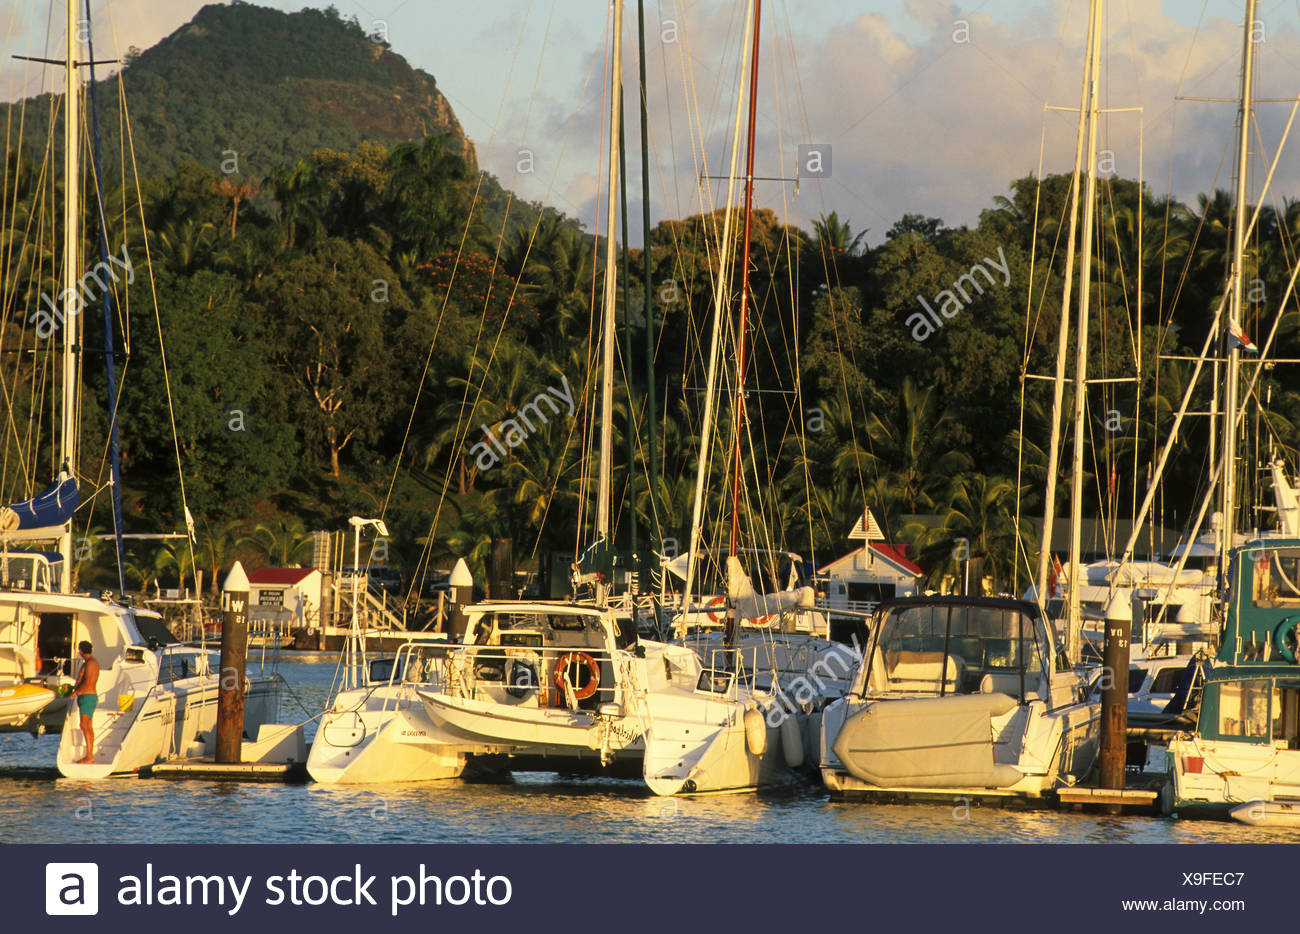 Hamilton Island yachting haven, Australien, Queensland, Hamilton Island, Barrier Reef - Stock Image